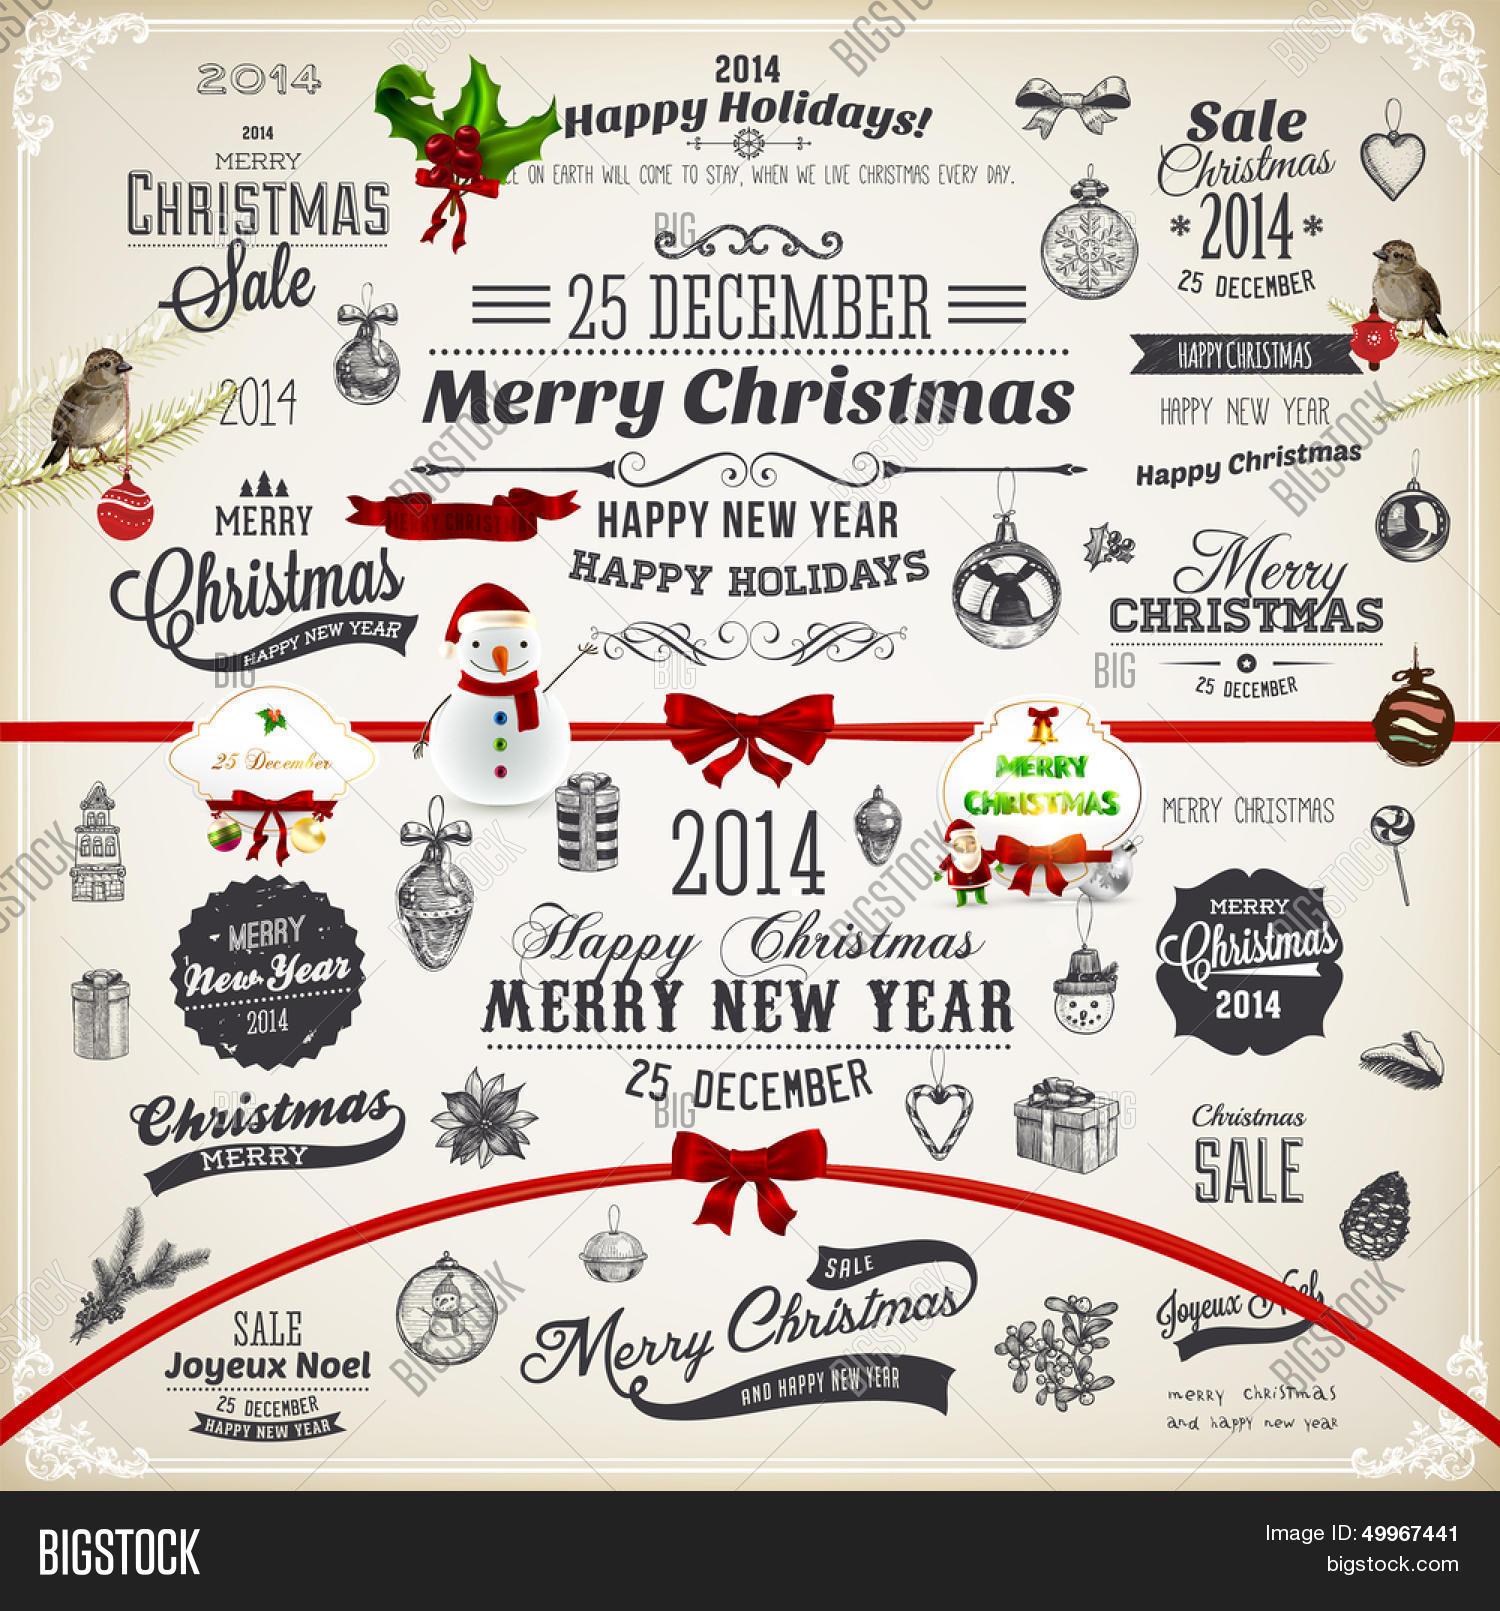 Christmas Decoration Vector & Photo (Free Trial)   Bigstock